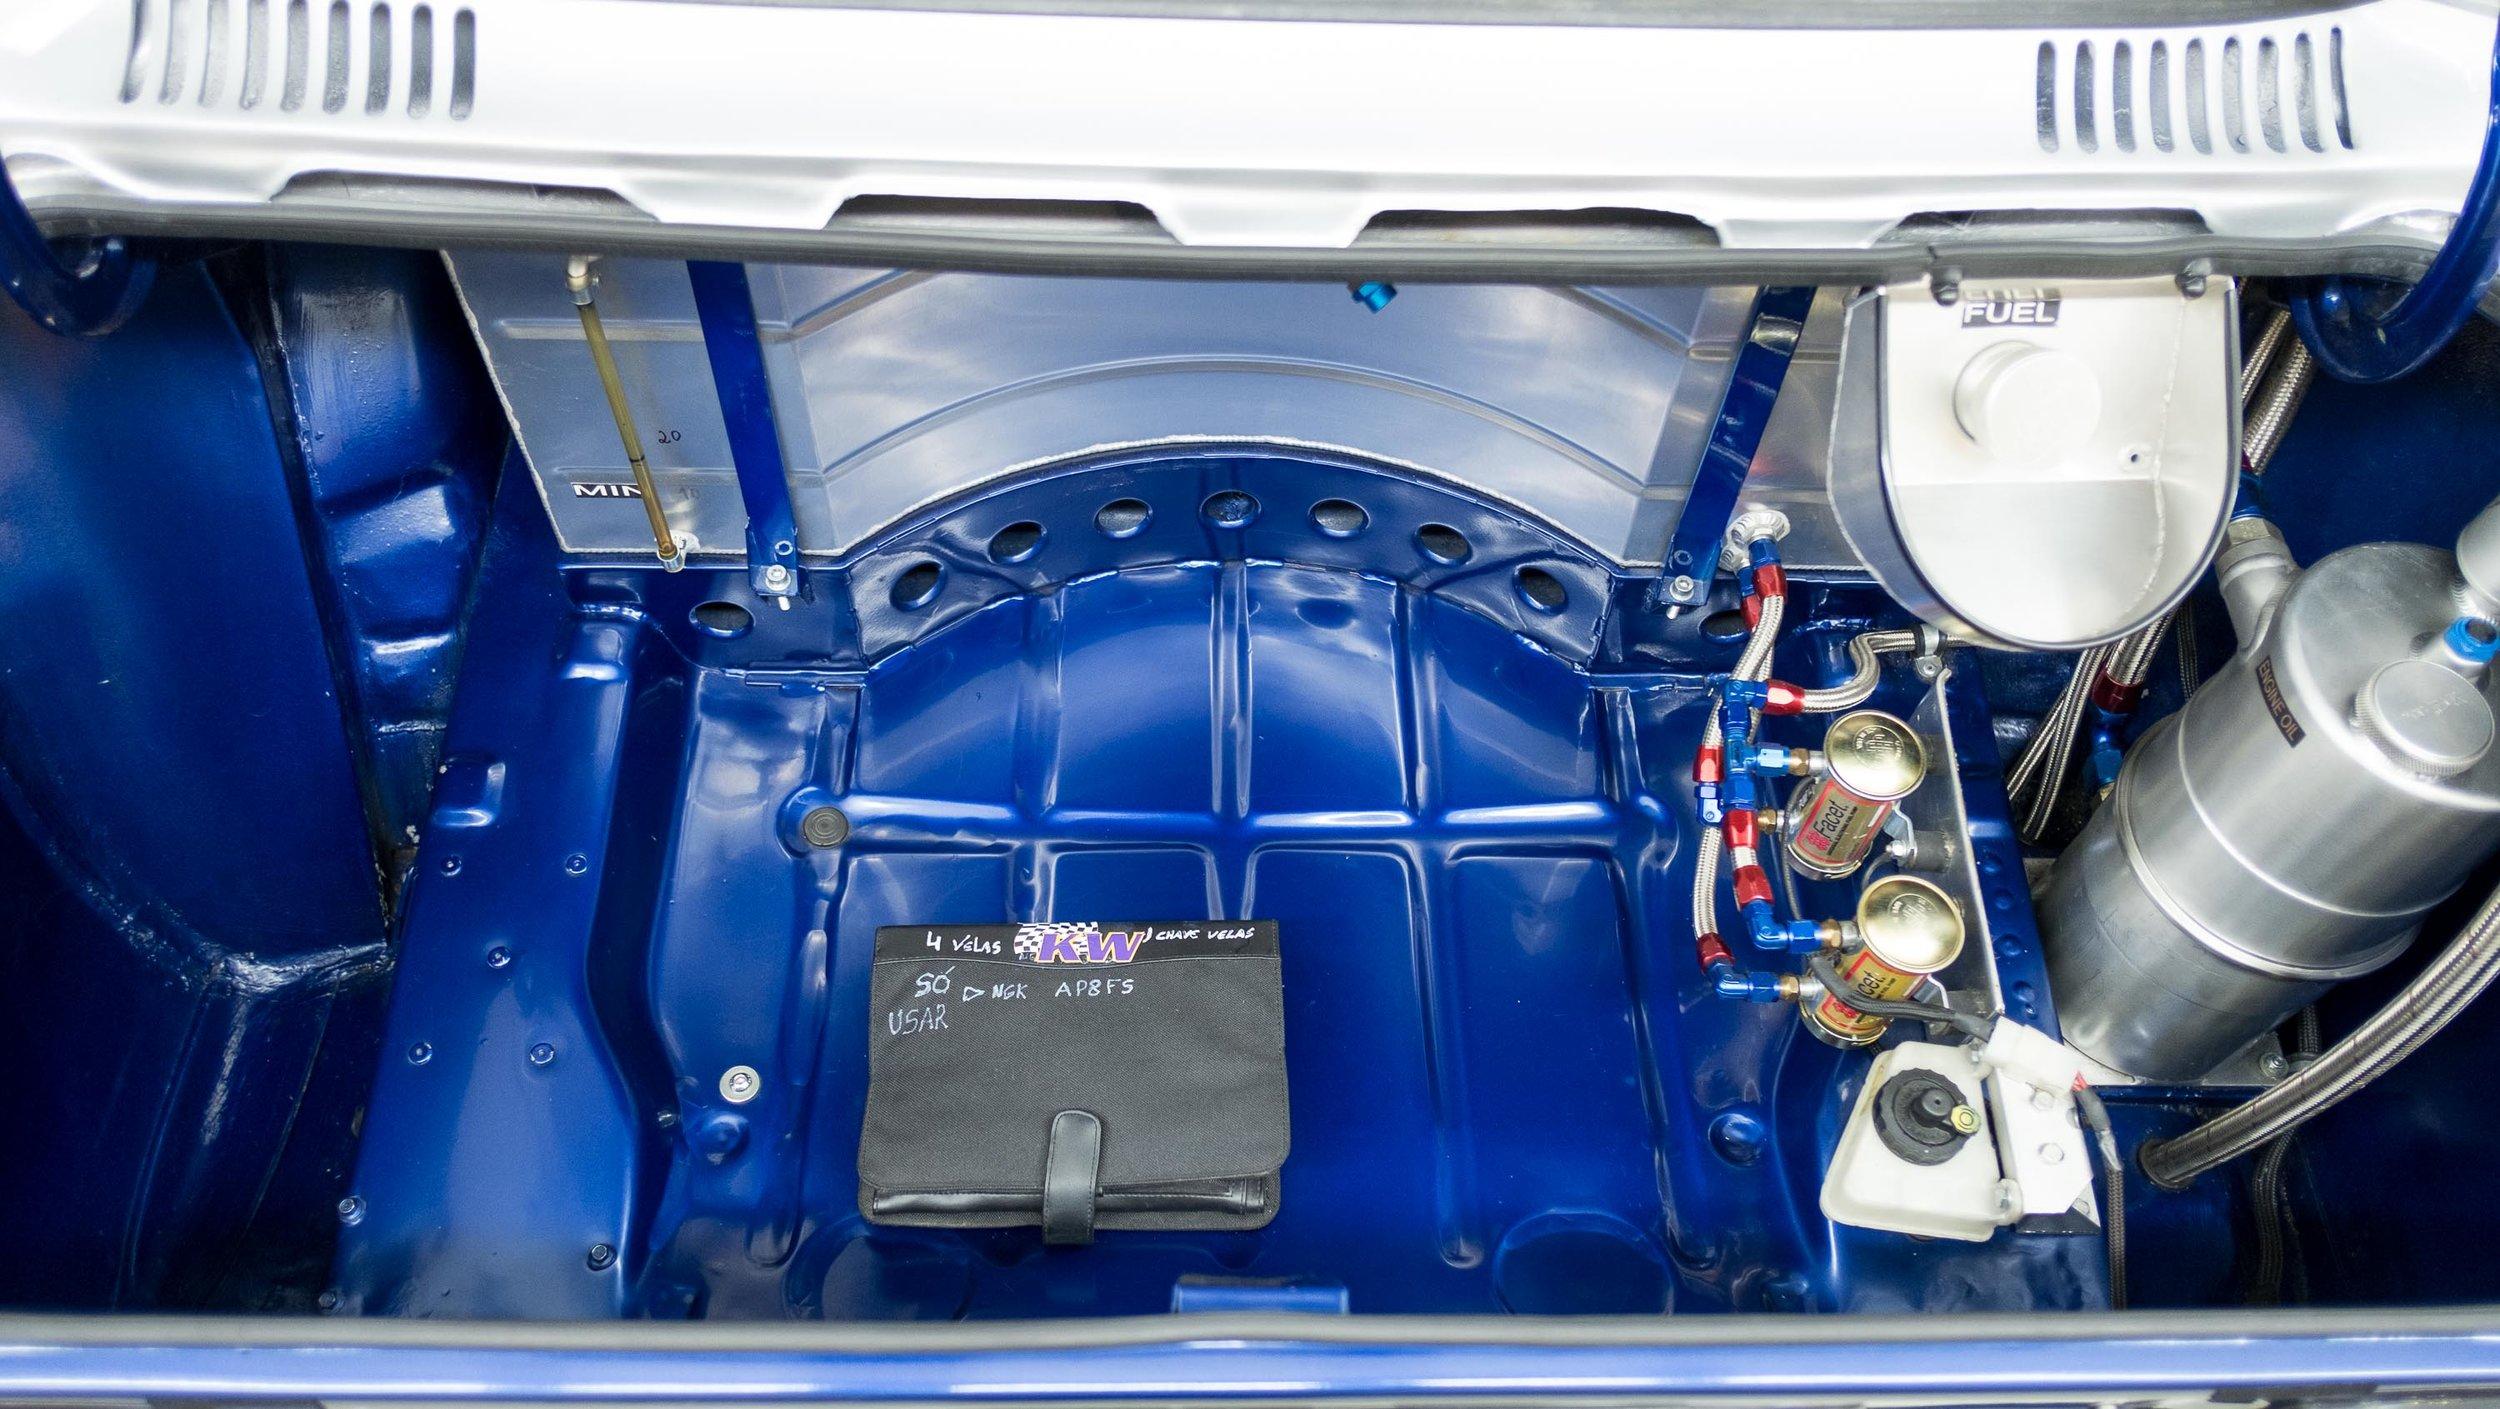 coolnvintage Ford Escort MKI (59 of 87).jpg